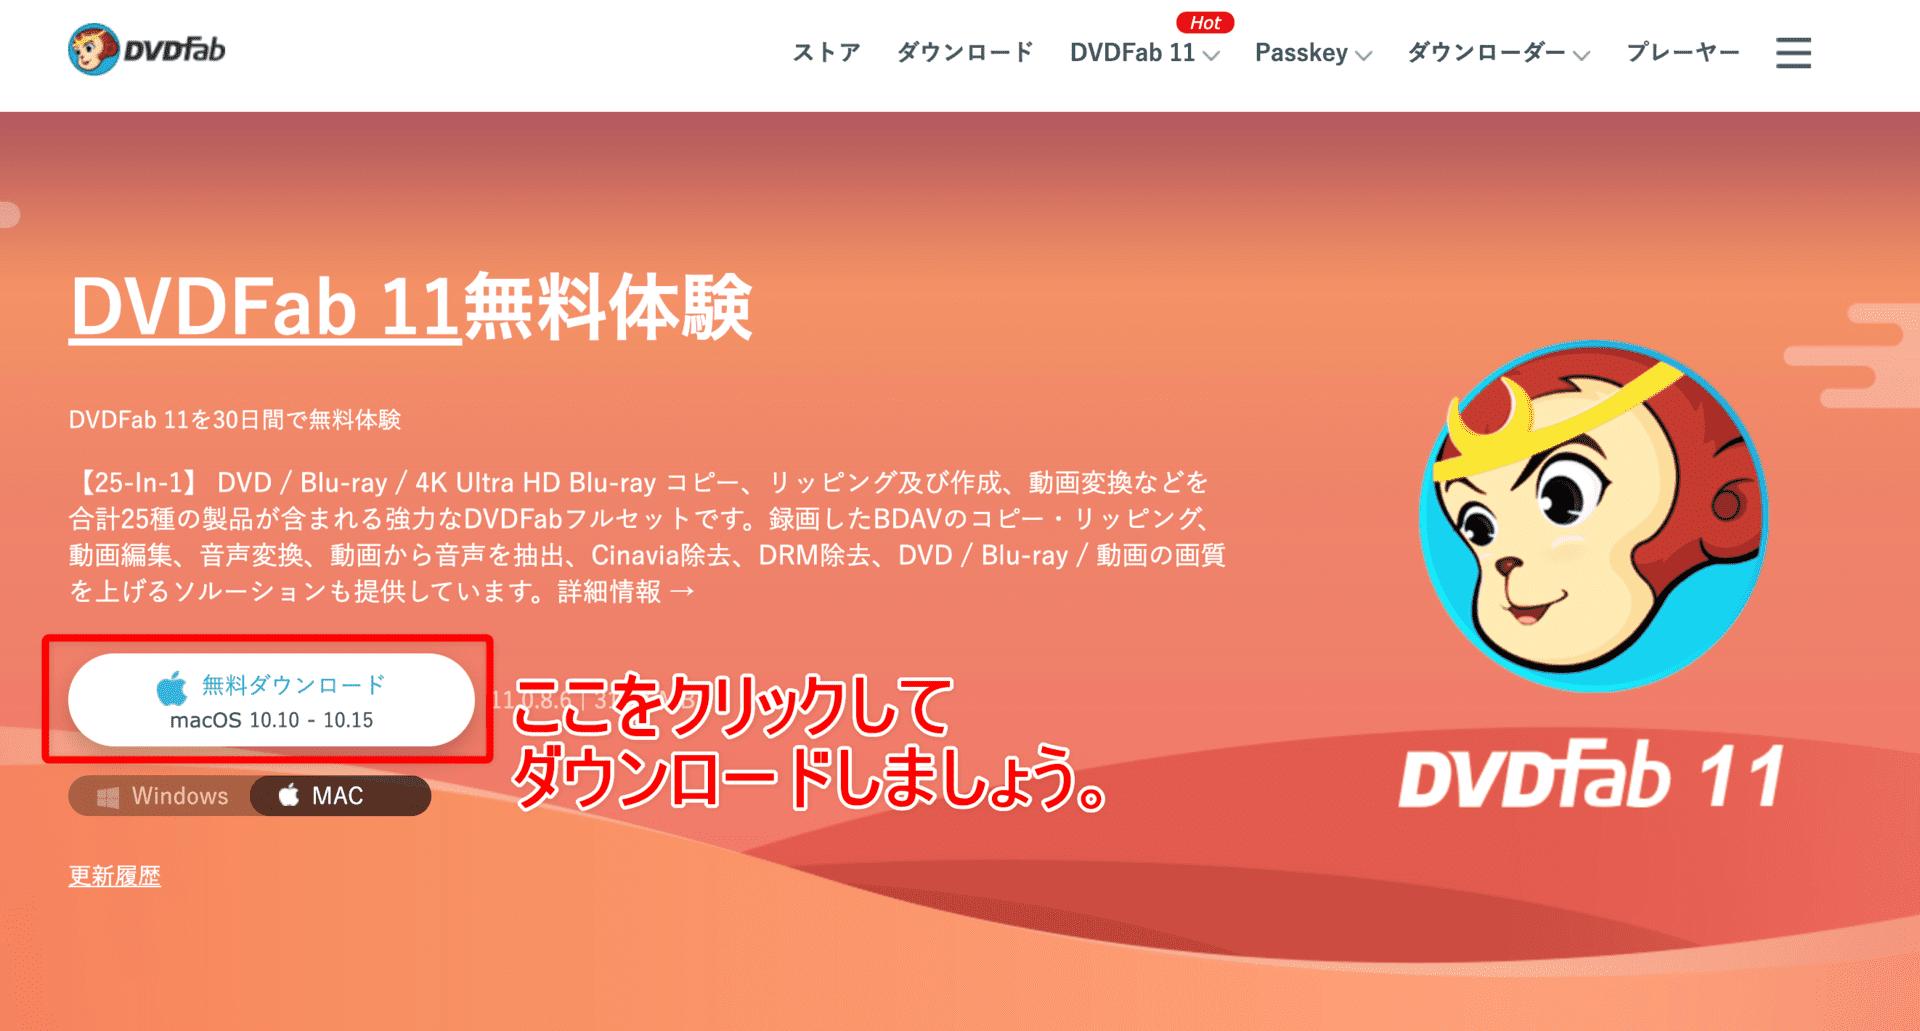 【DVDFab for macの使い方】Mac向けDVDFab無料体験版でDVDコピー!最強コピー性能を体感できるDVDFab11無料版for macの使い方|ソフトのインストール方法